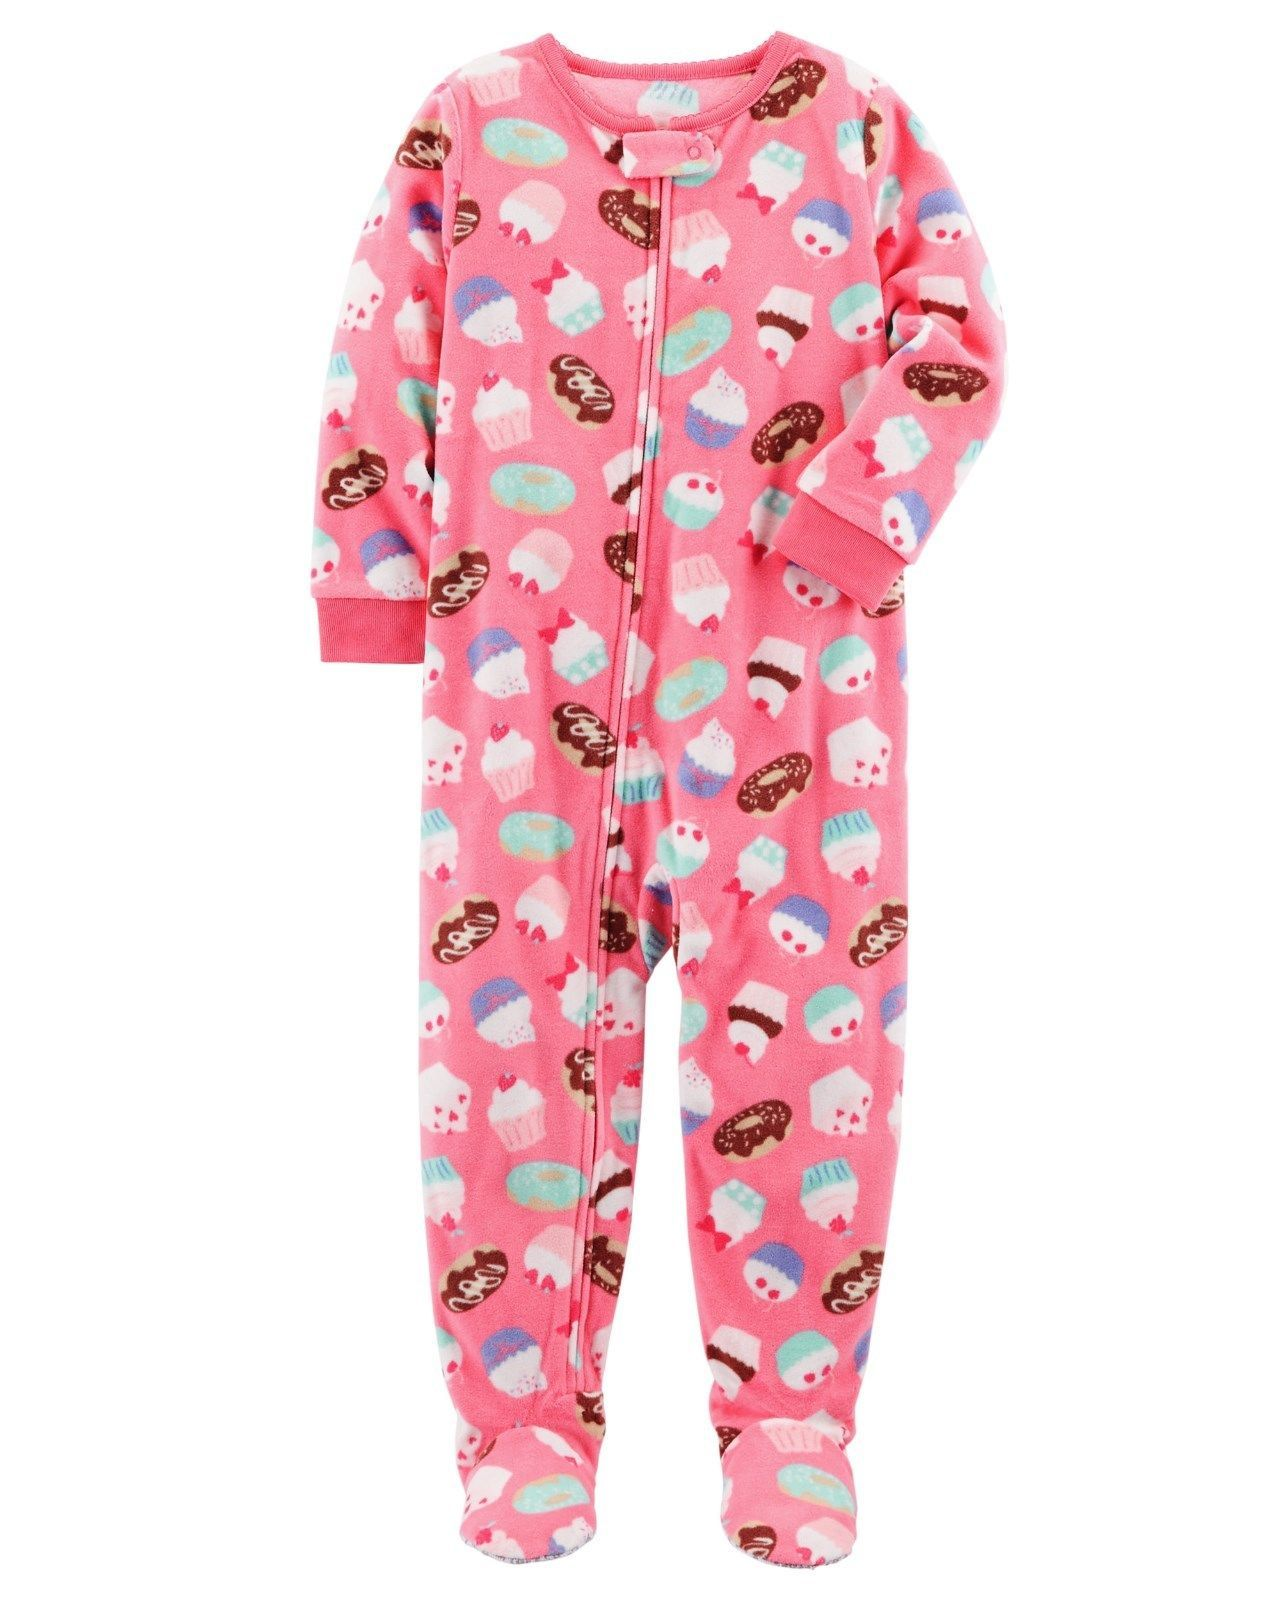 NWT Carter/'s Unicorn Toddler Girls Pink Leggings 2T 3T 4T 5T